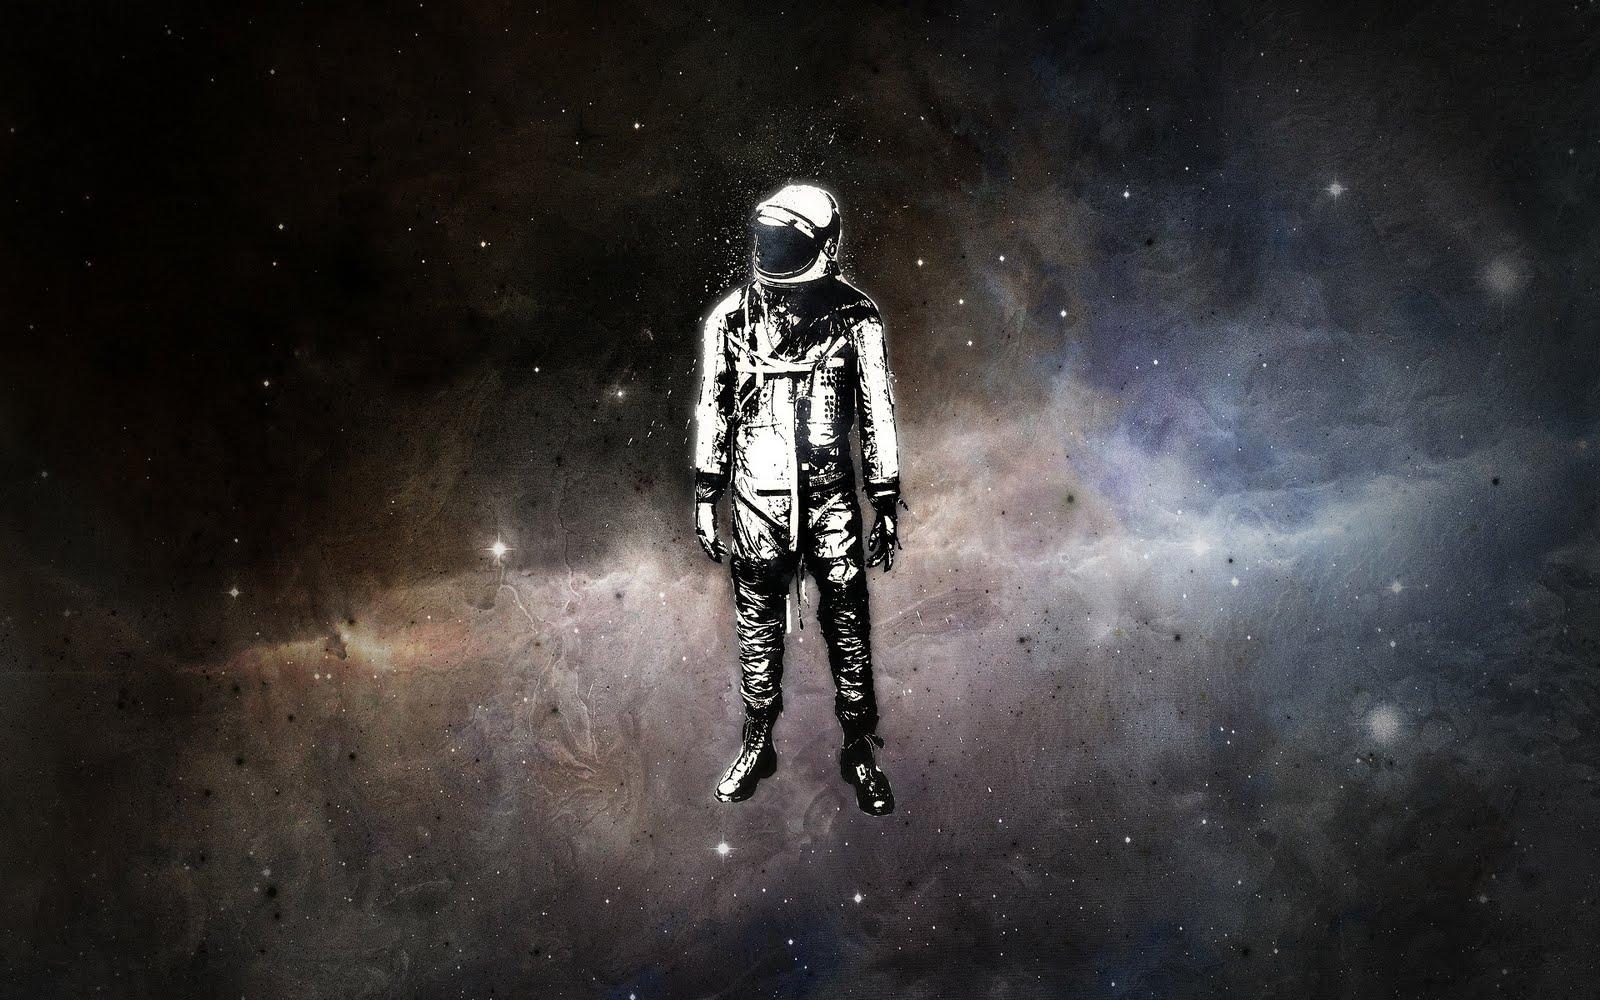 Cat Astronaut Wallpaper   Pics about space 1600x1000